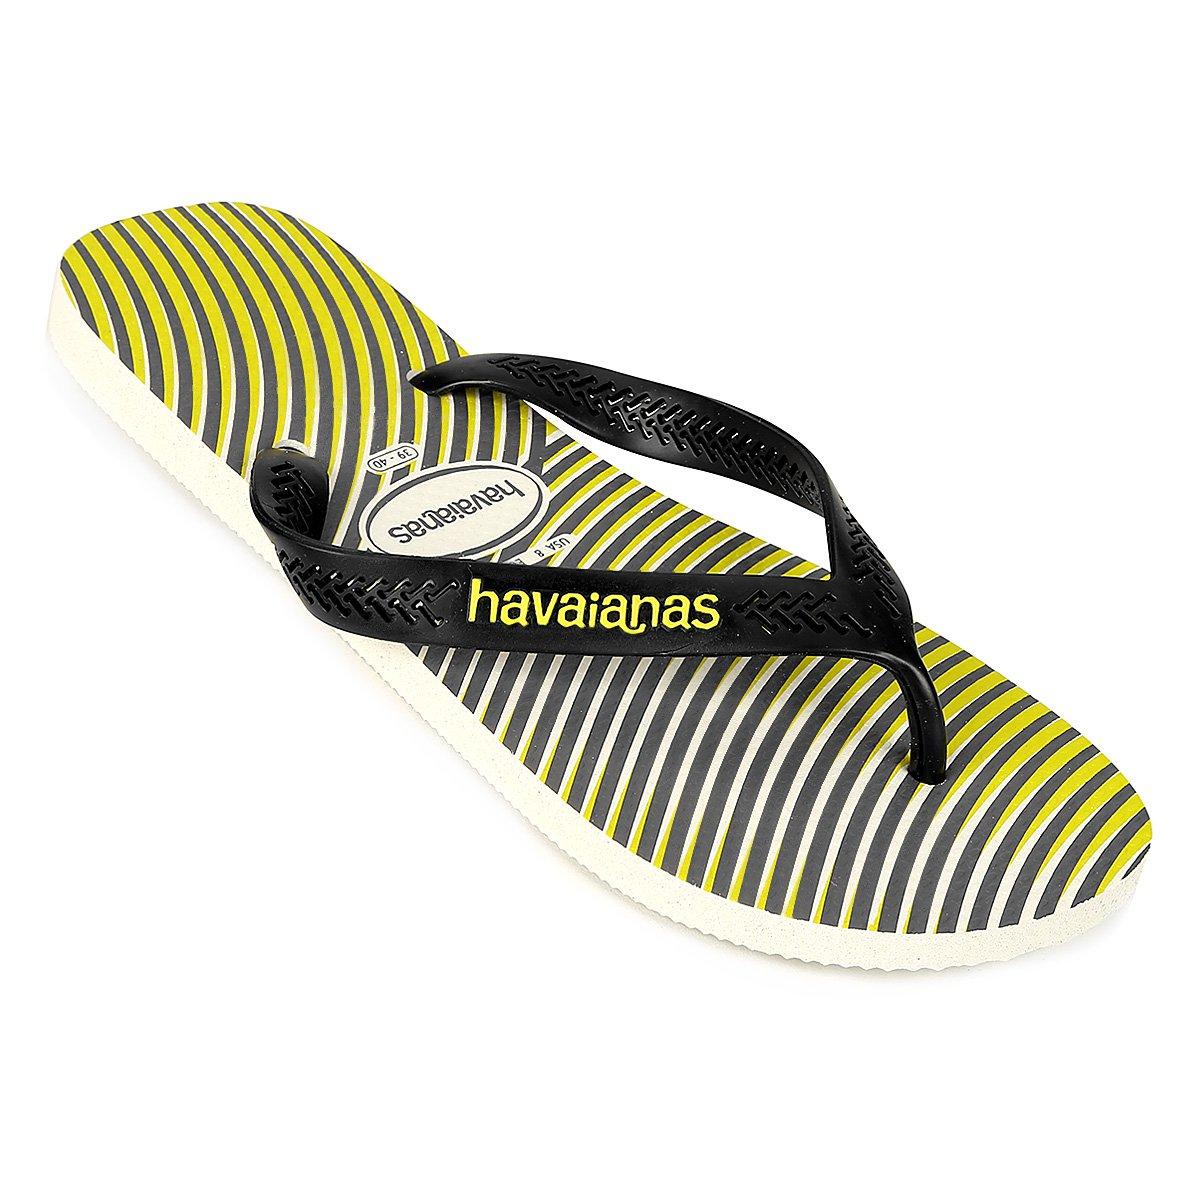 Masculina e Havaianas Havaianas Sandália Sandália Amarelo Graphic Preto Aero XK10q